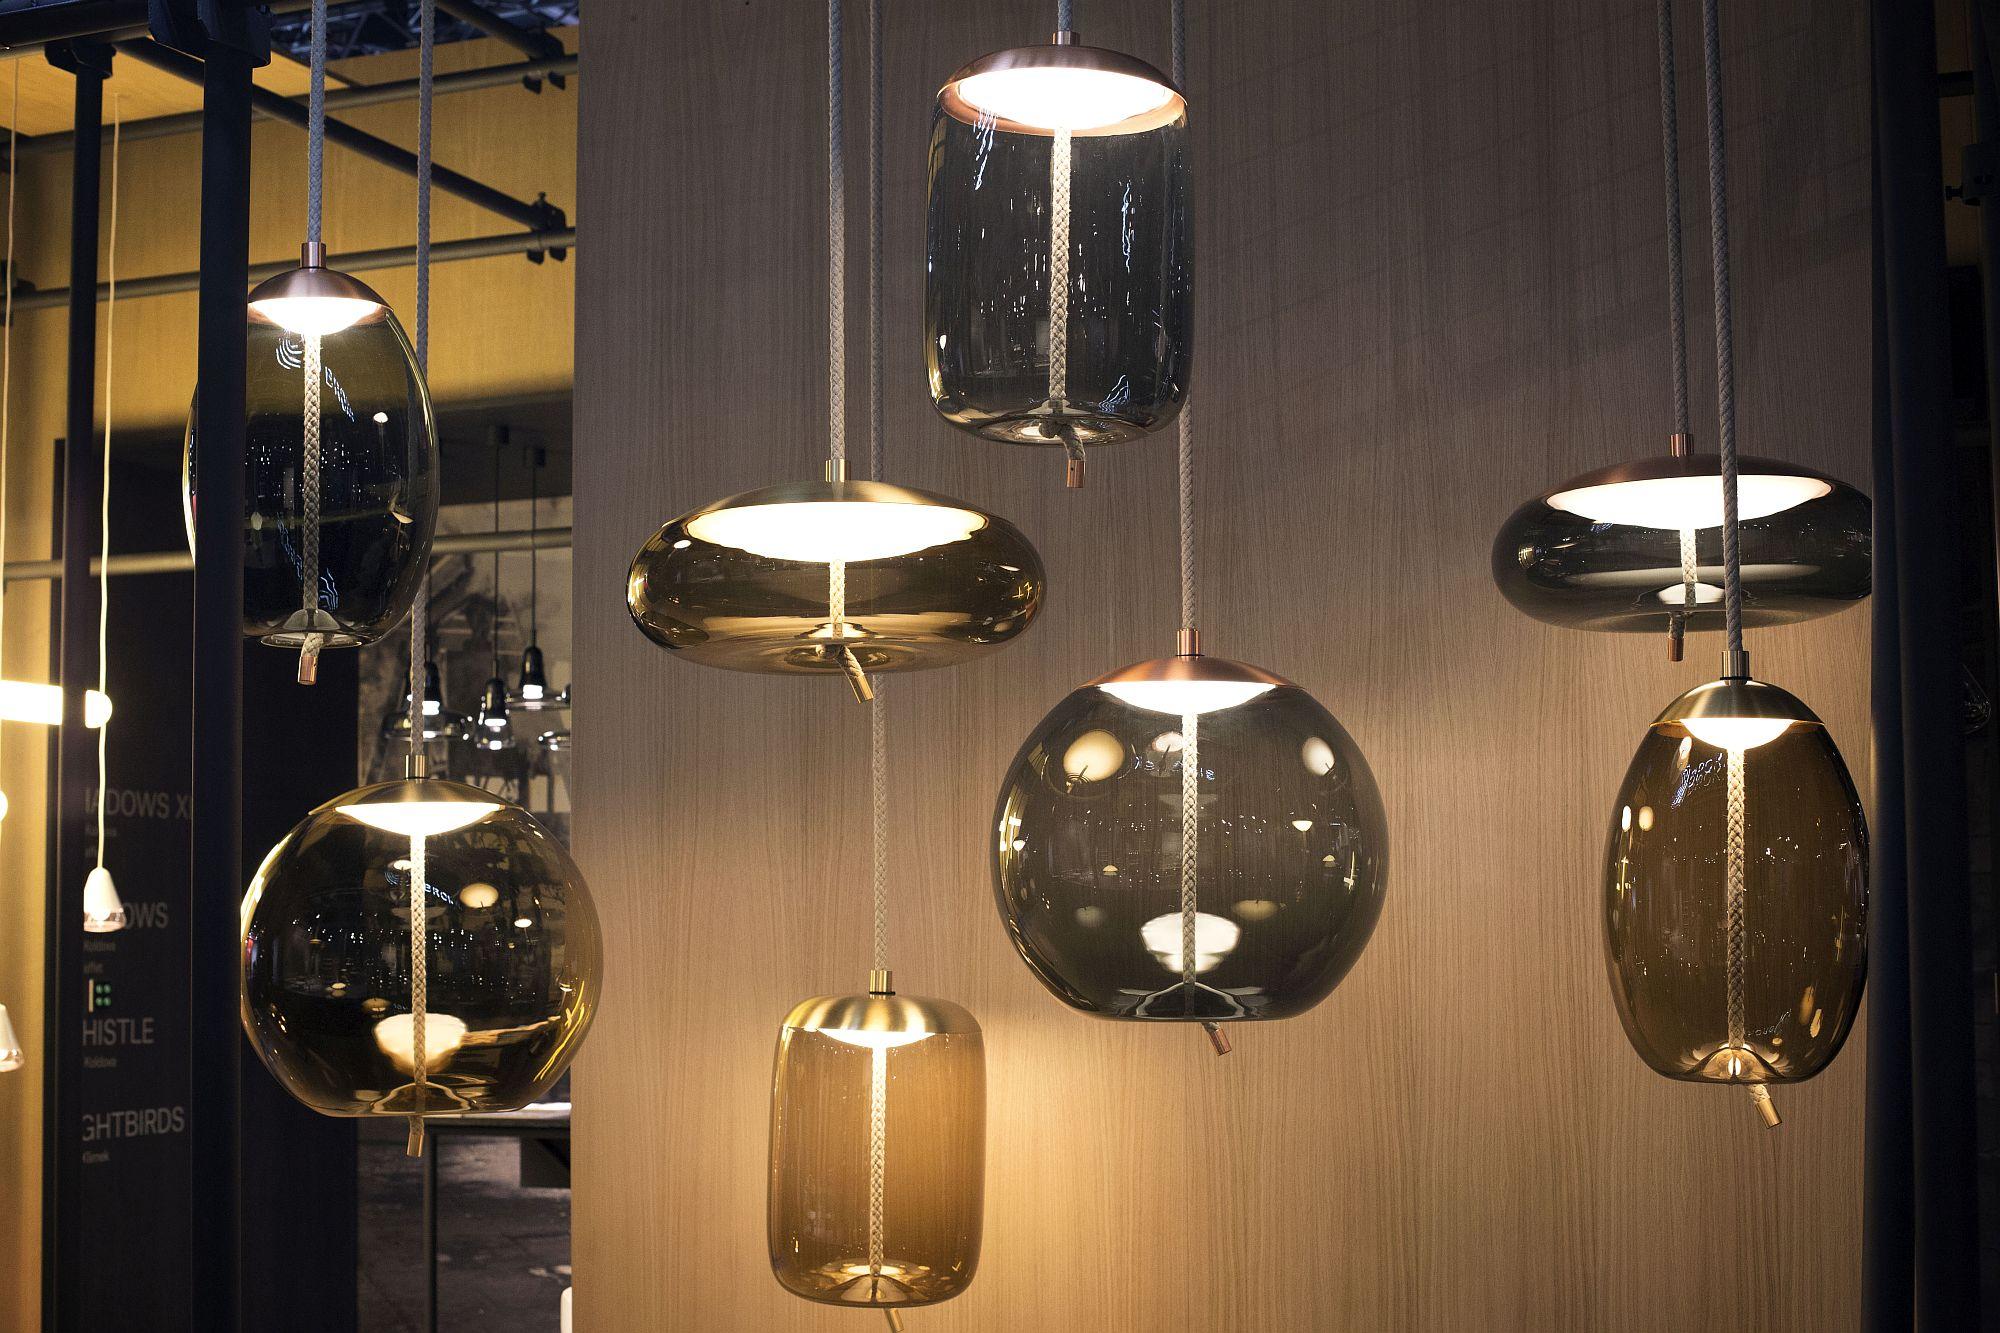 Handmade-Bohemian-glass-lighting-fixtures